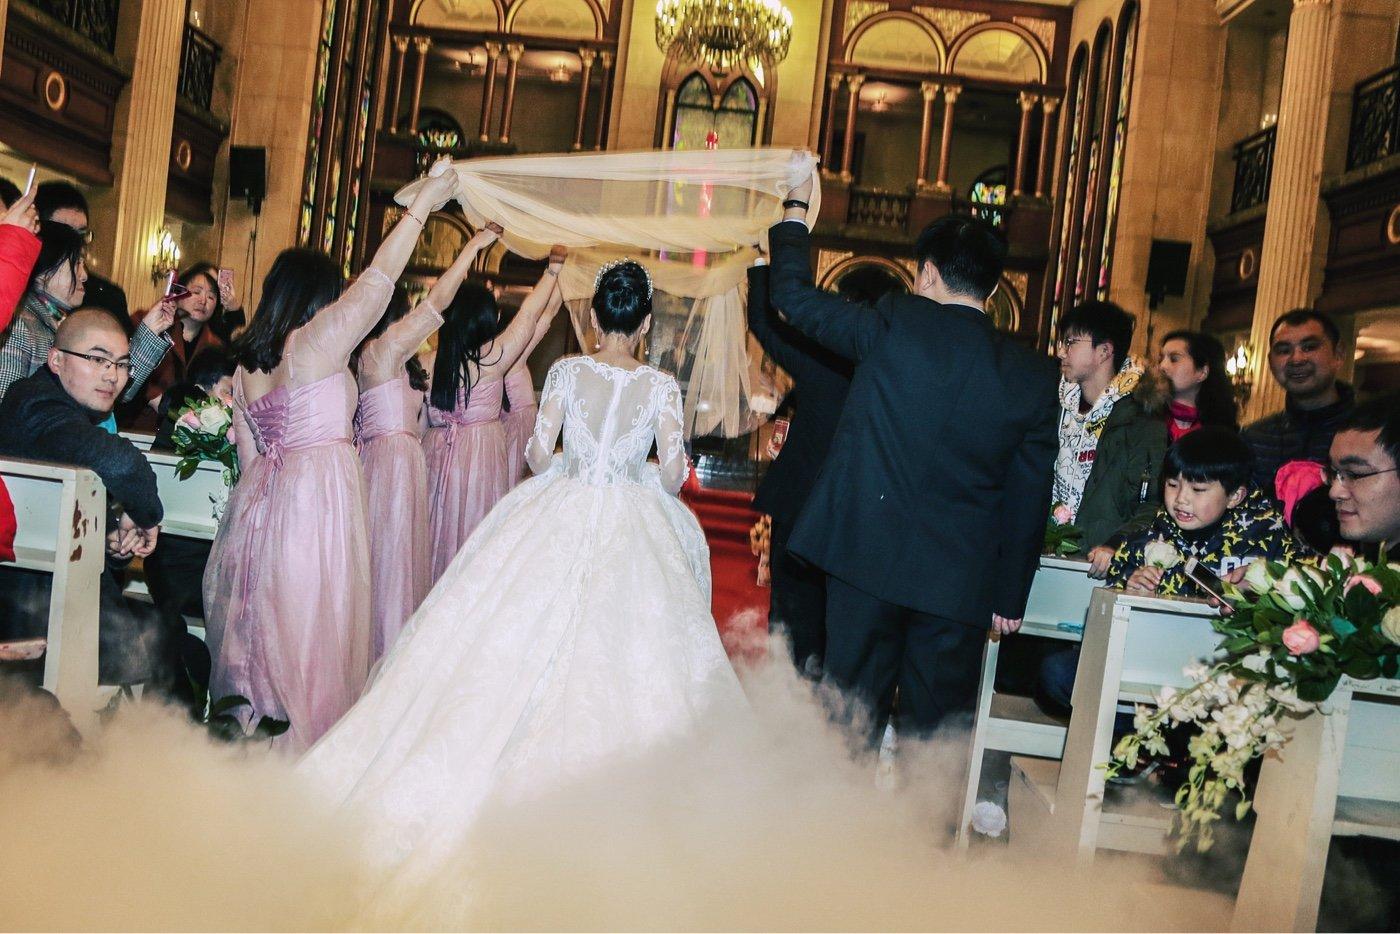 「Fantasy Wedding」&明珠教堂⛪14